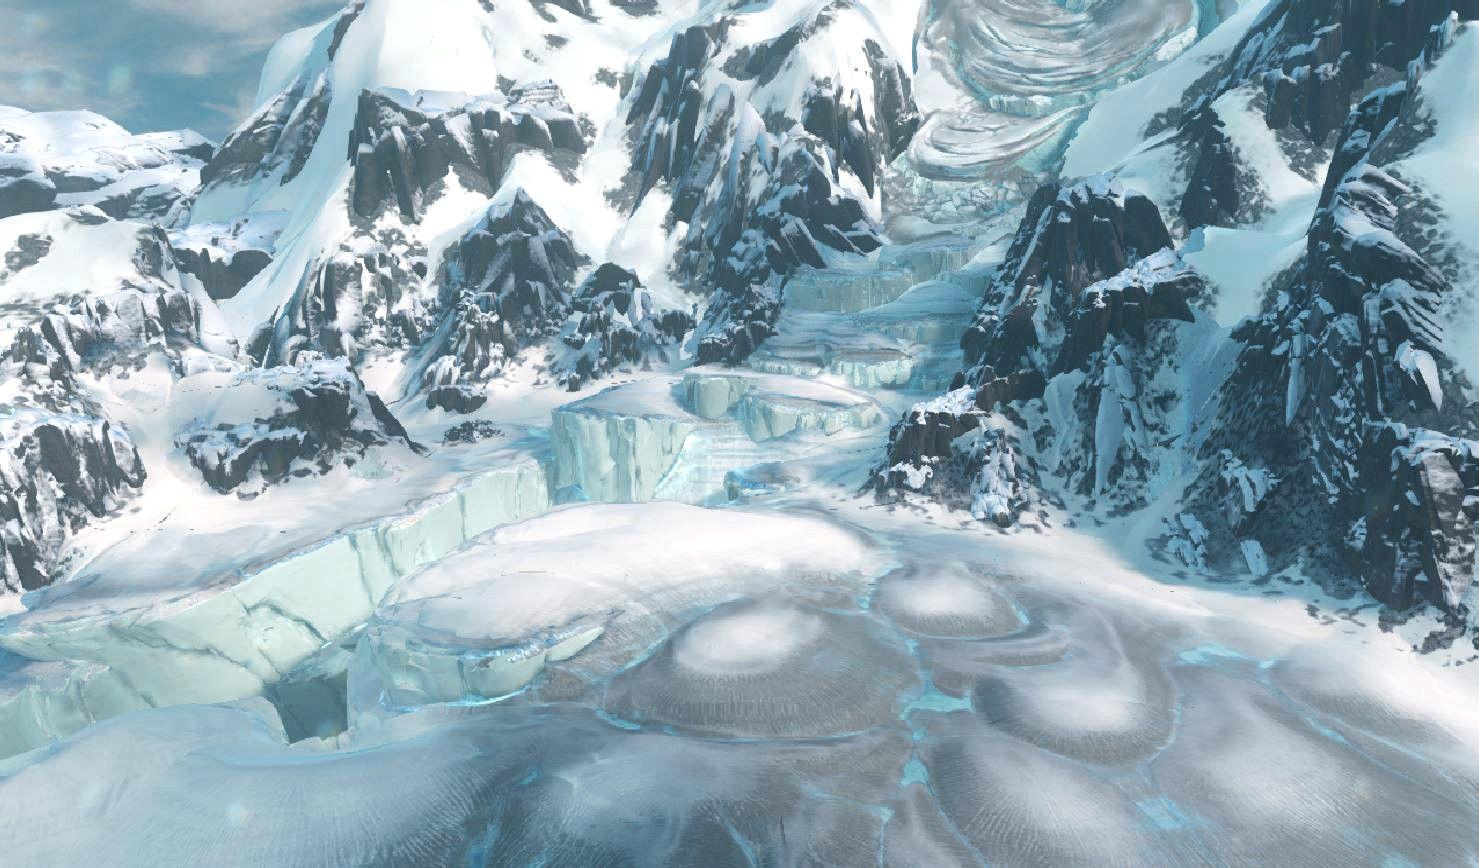 ArtStation - Halo 5: